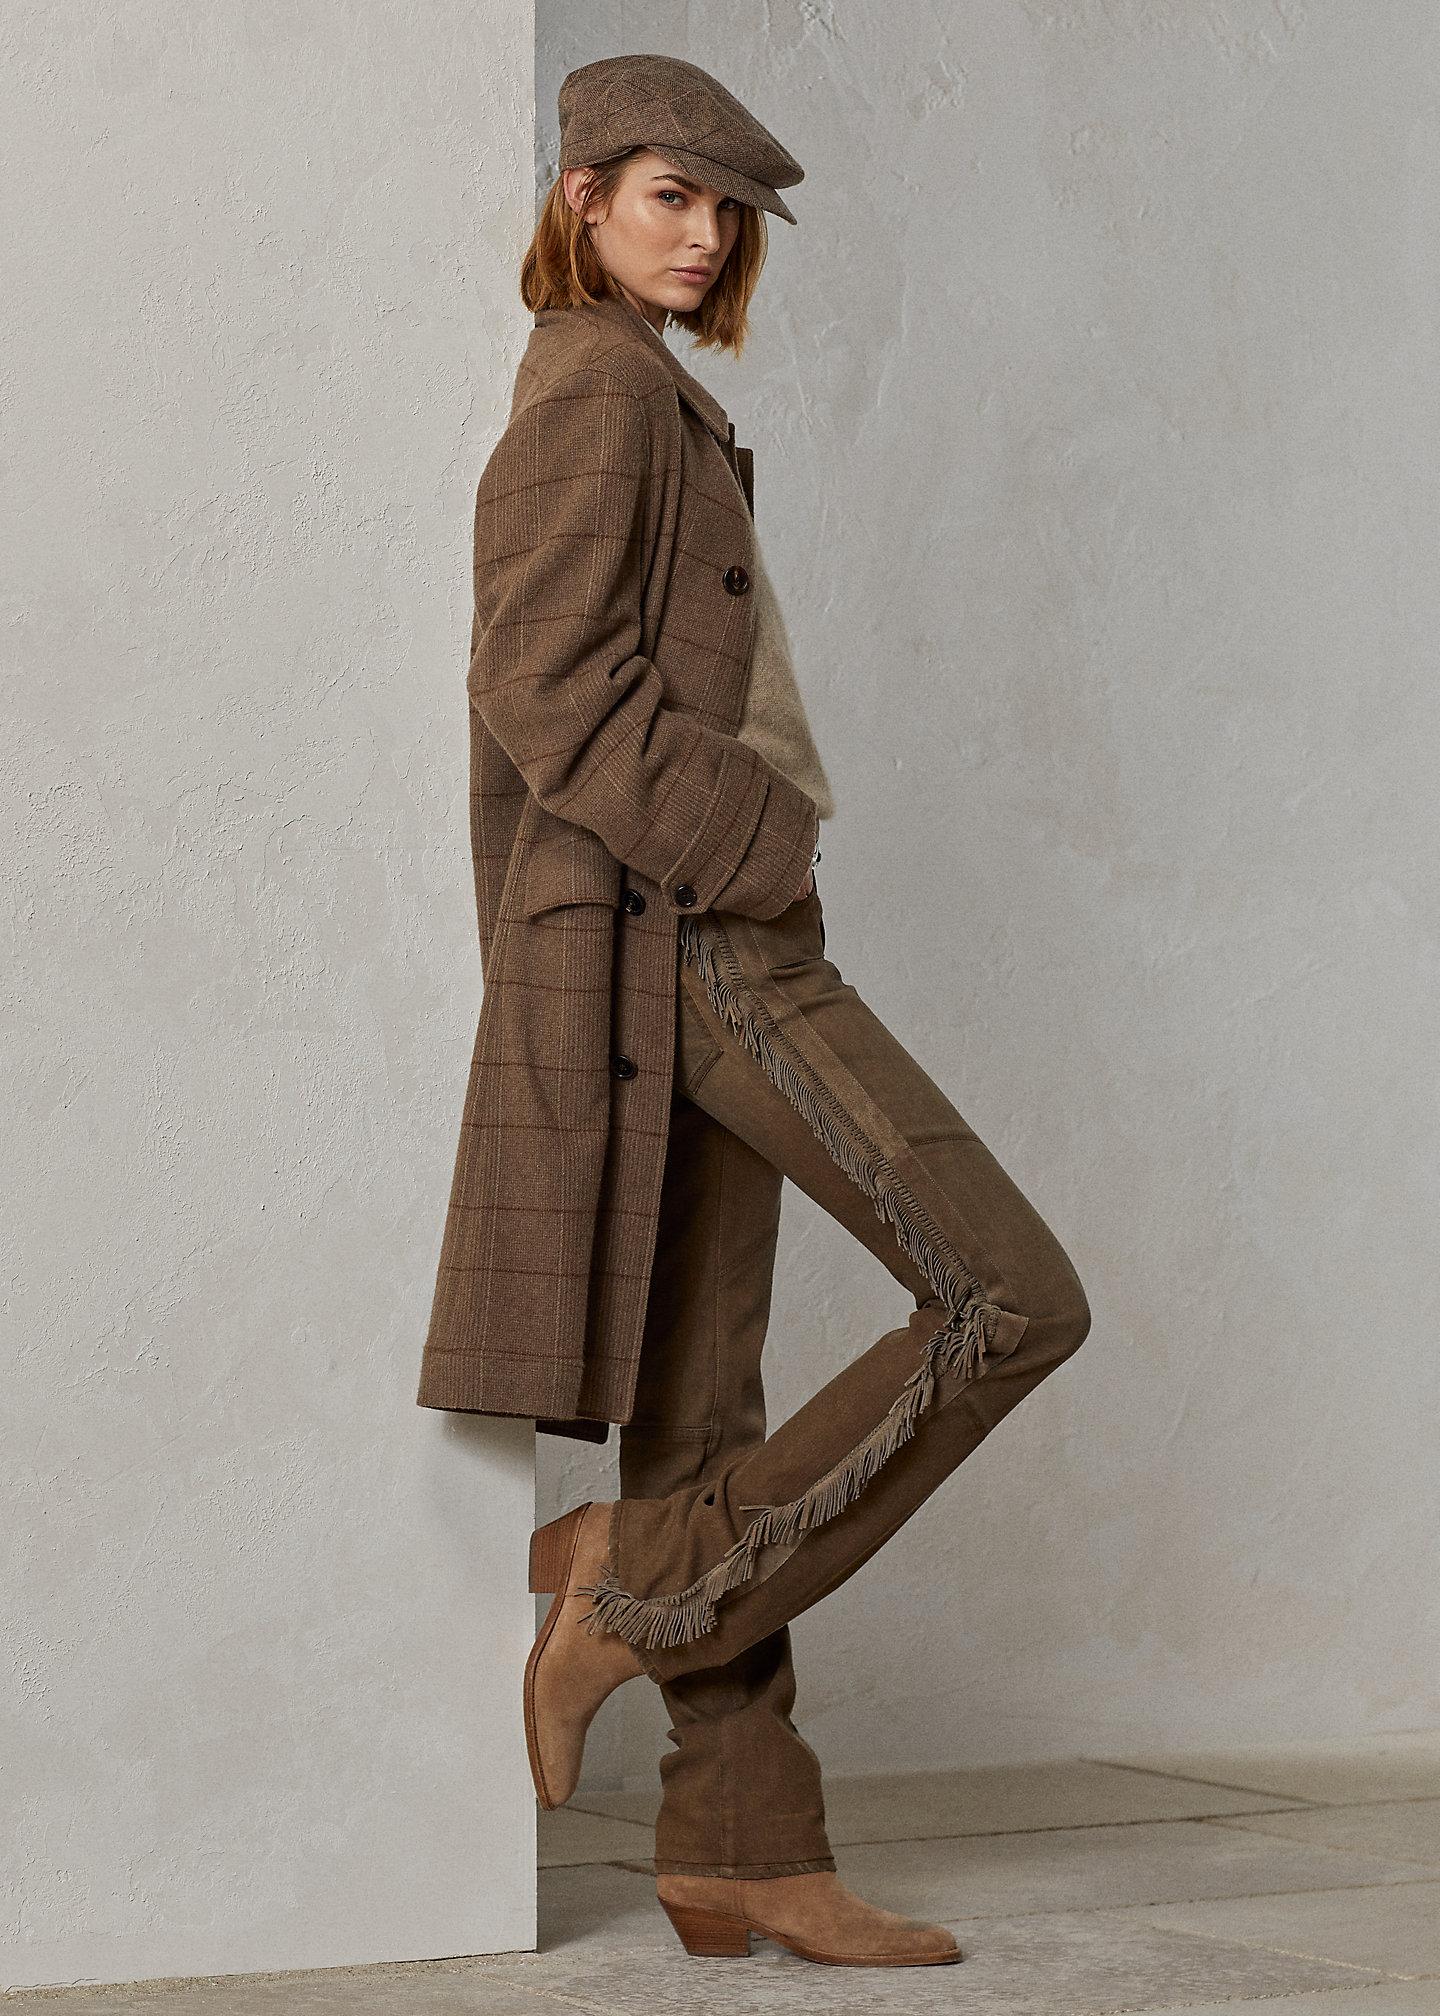 Ralph Lauren Collection Fringe Slim Straight Ankle Jean 1